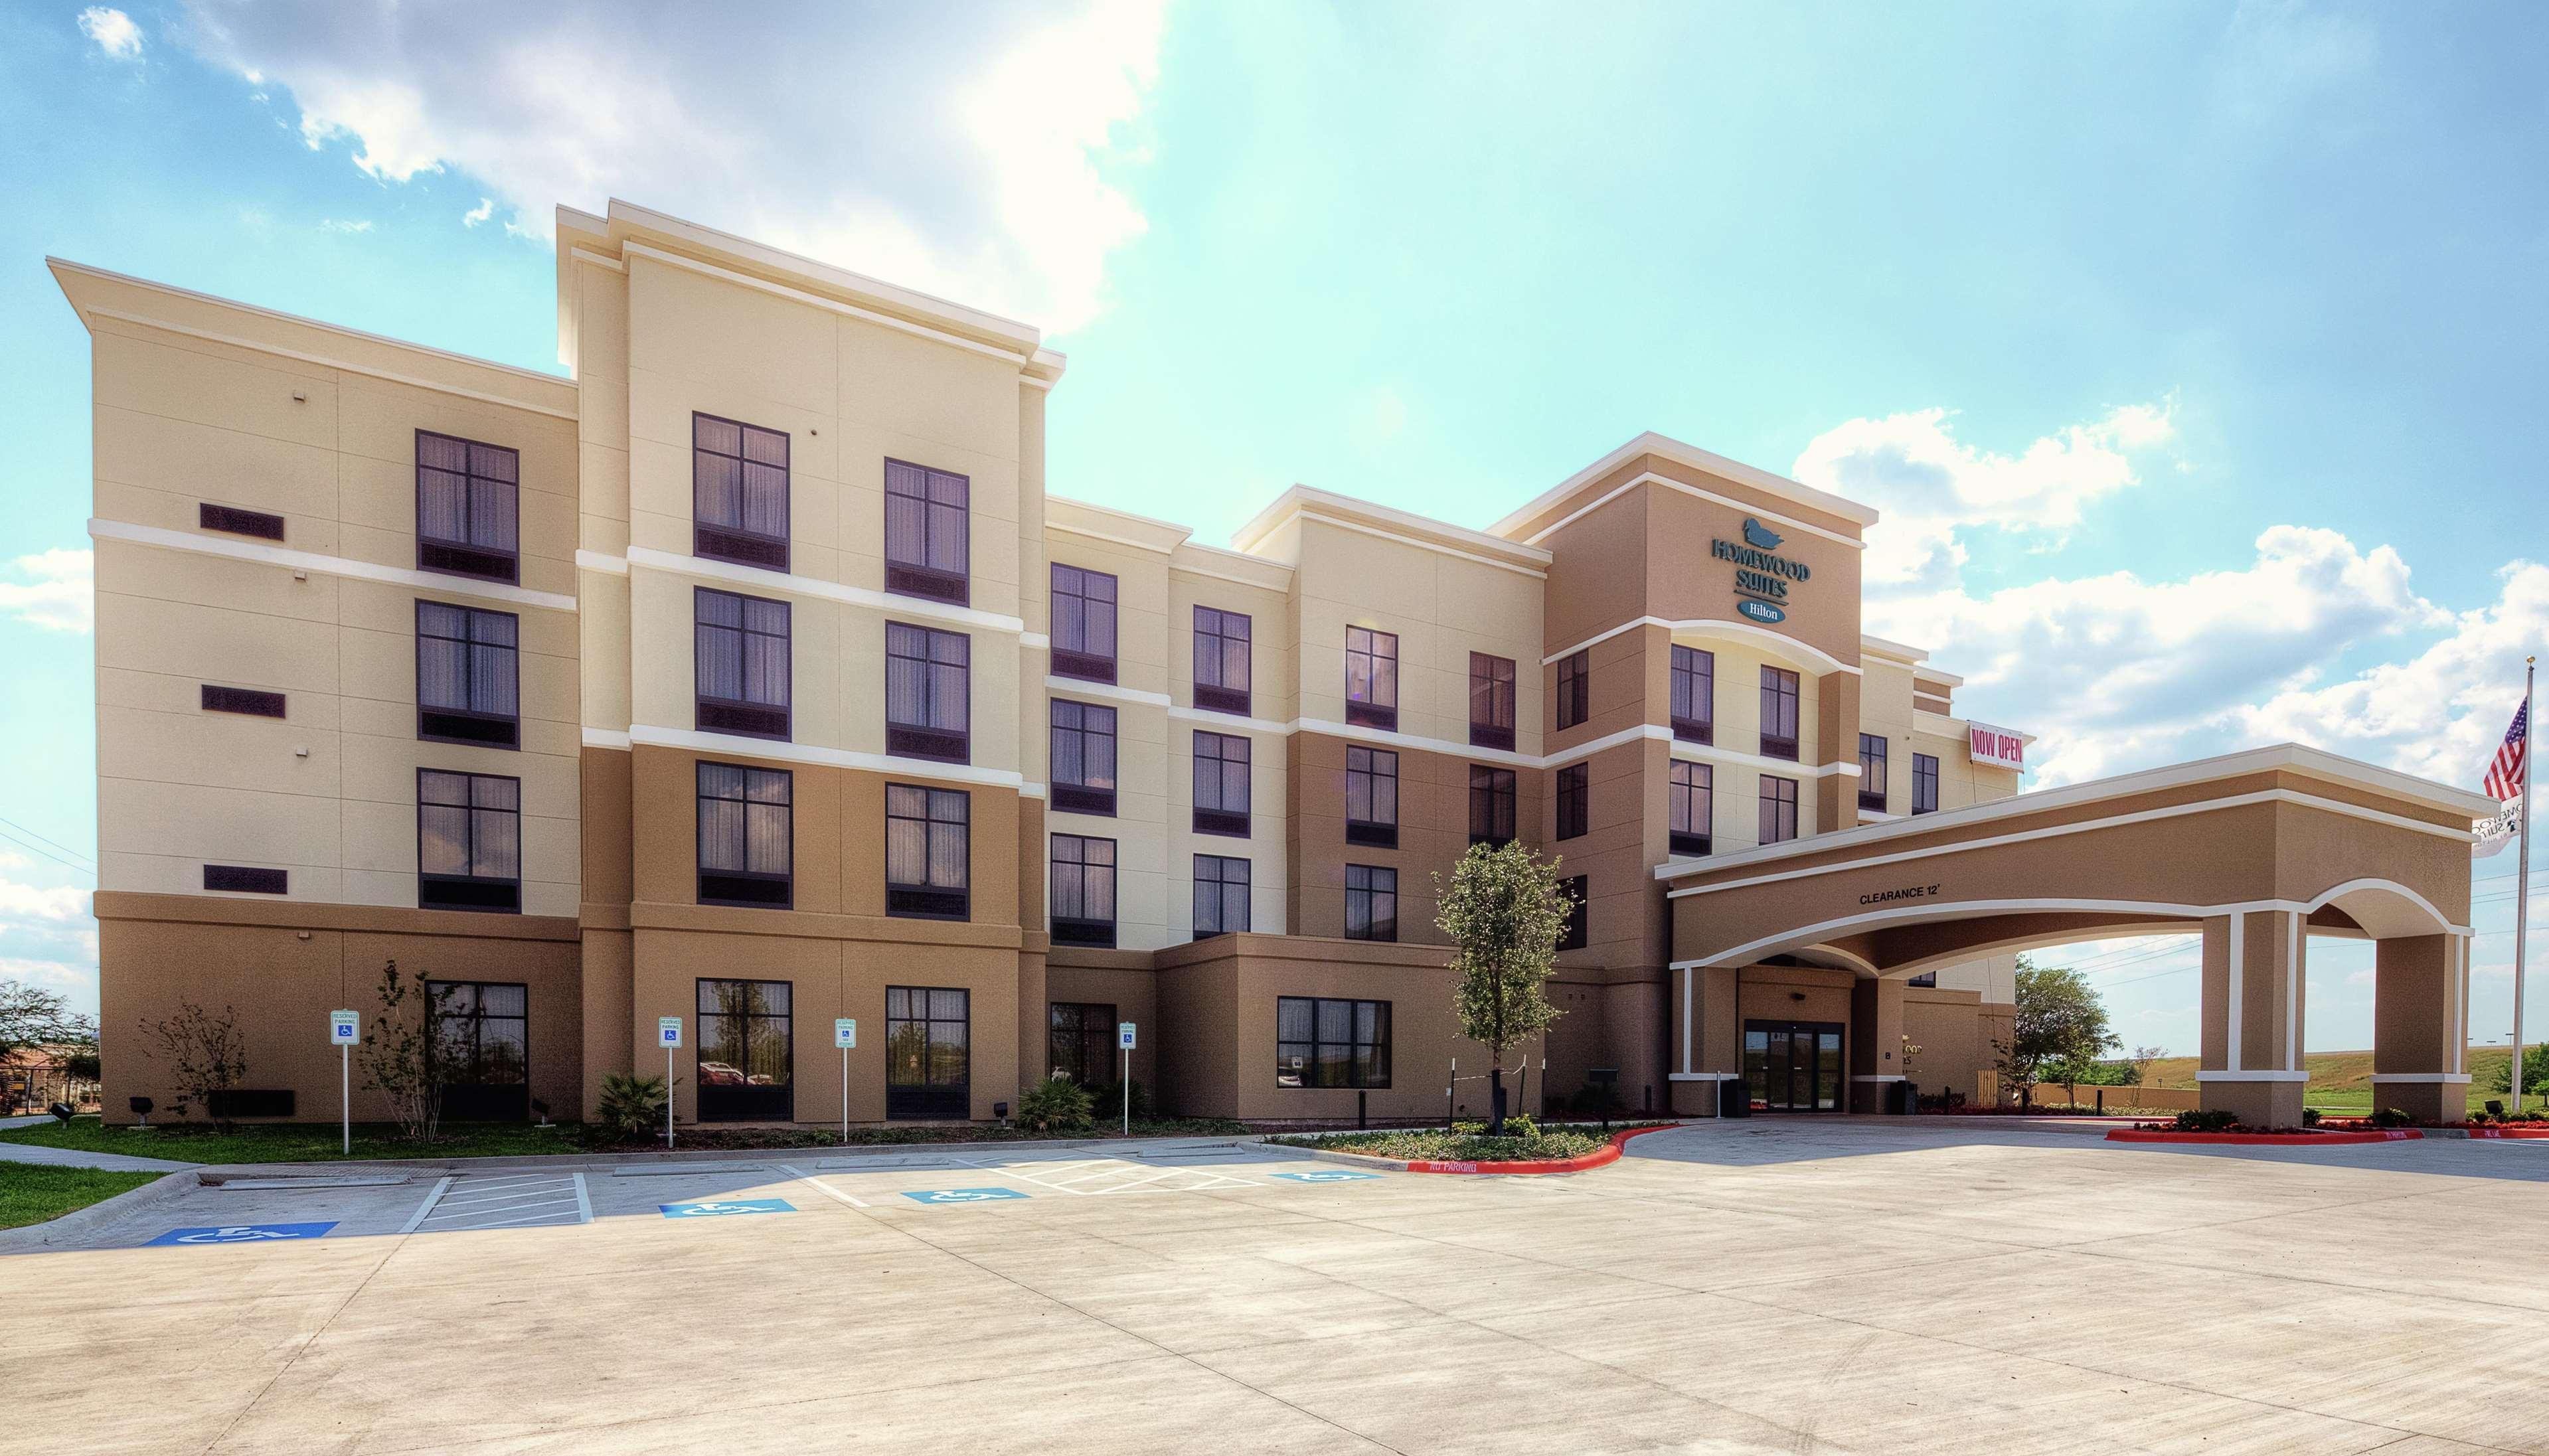 Homewood Suites by Hilton Victoria, TX